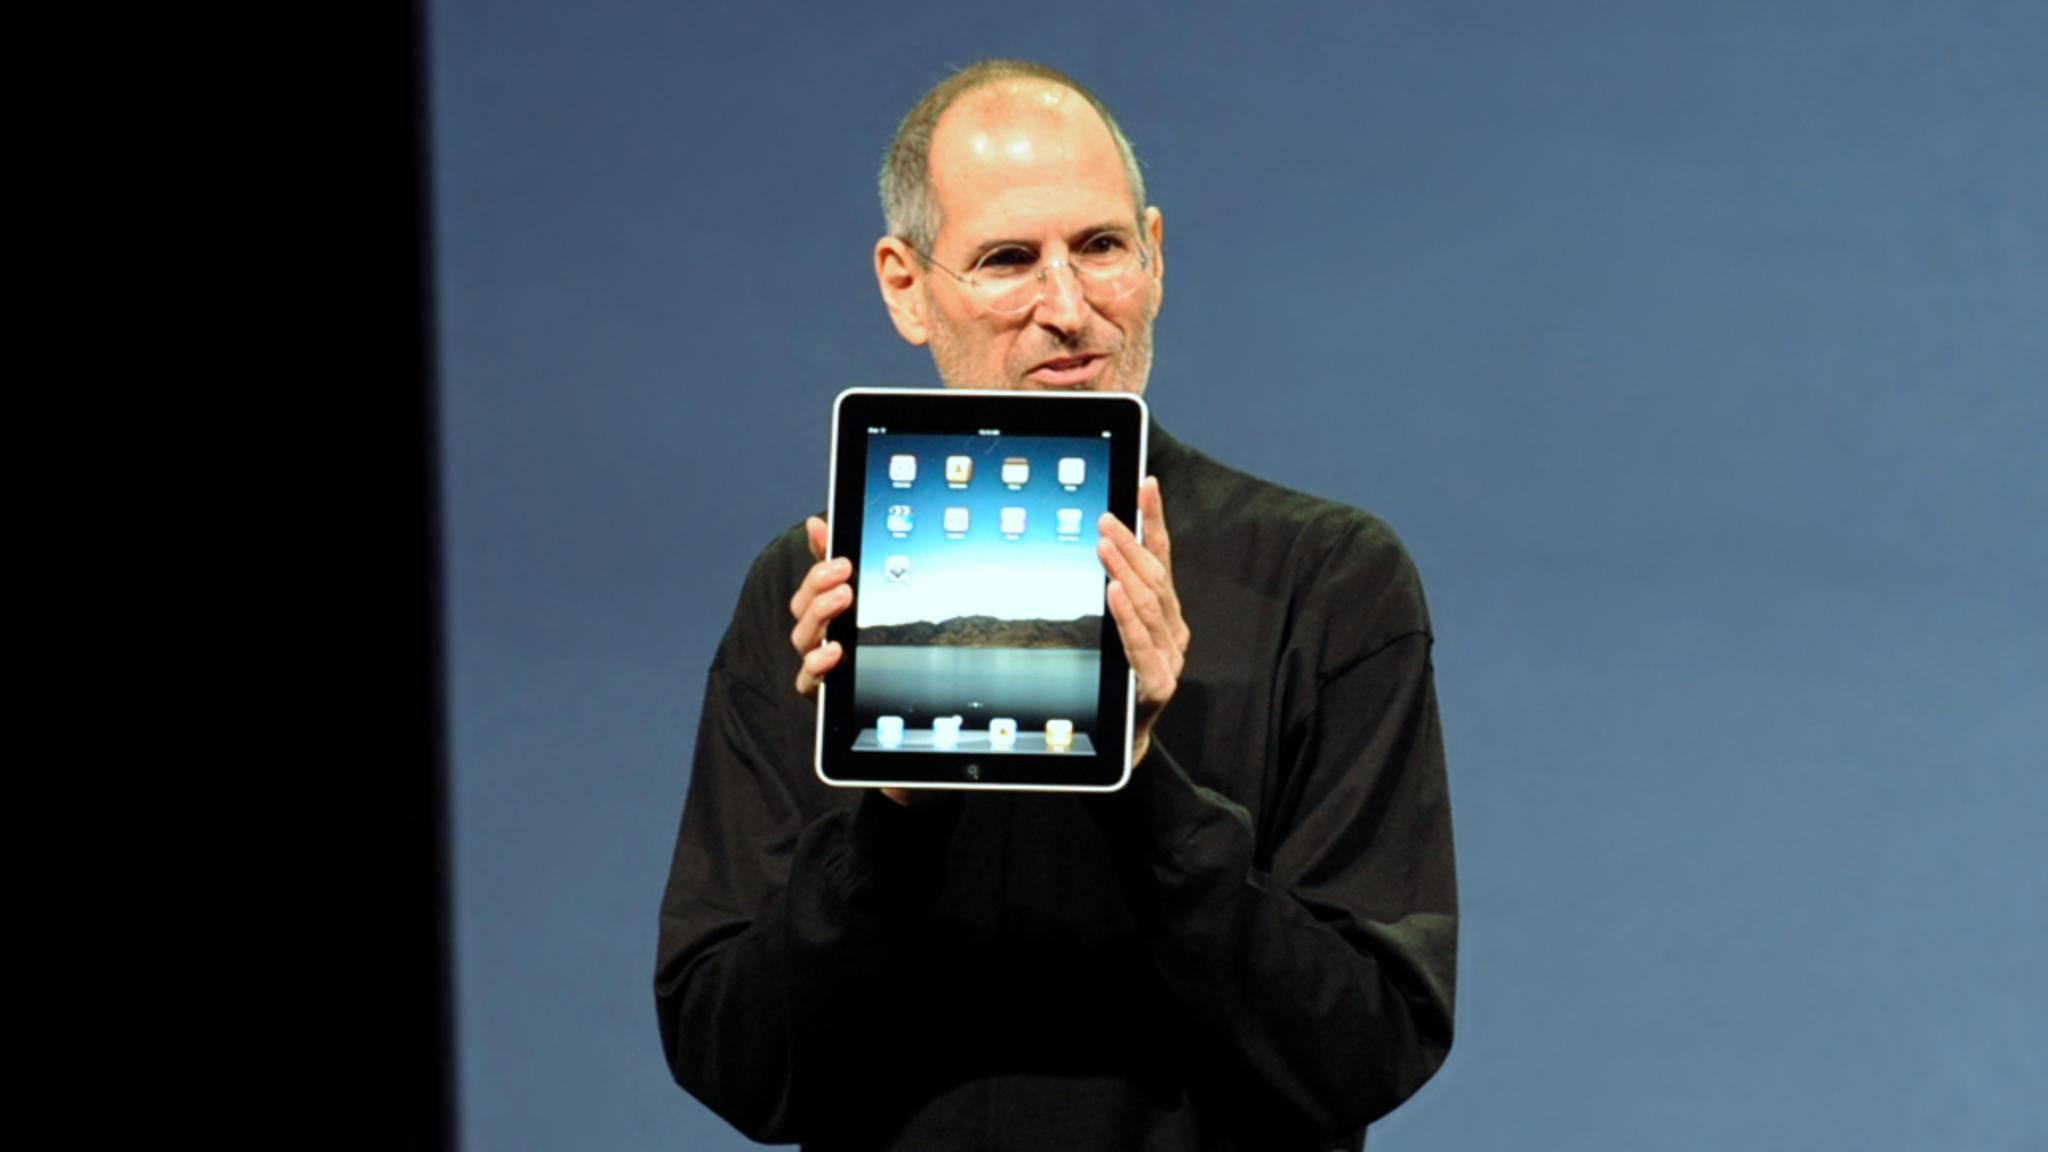 Steve Jobs mit erstem iPad